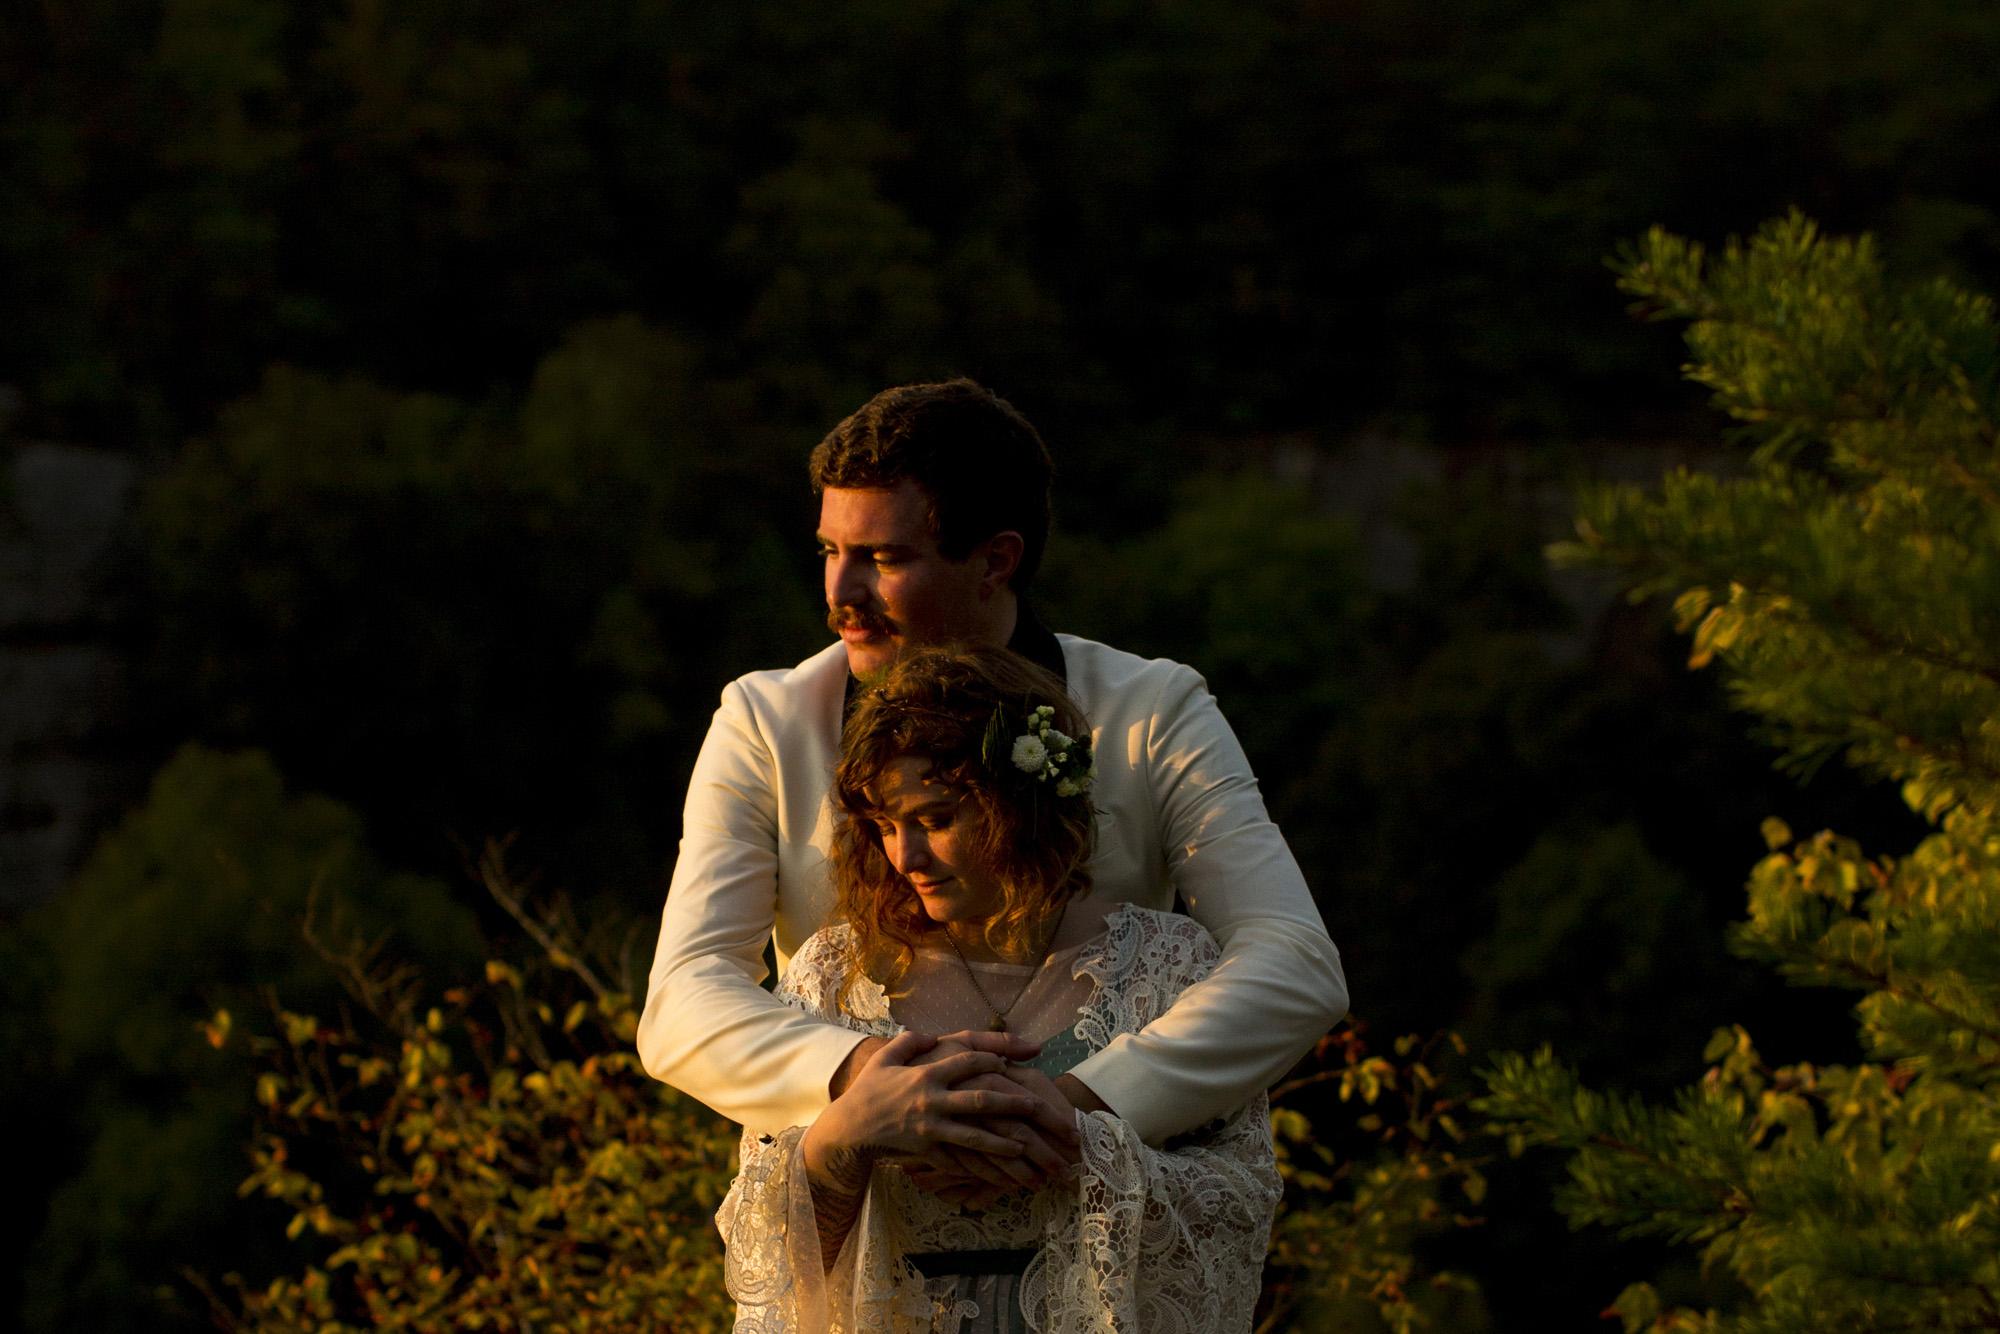 Seriously_Sabrina_Photography_Red_River_Gorge_Kentucky_Wedding_ShawnDana166.jpg